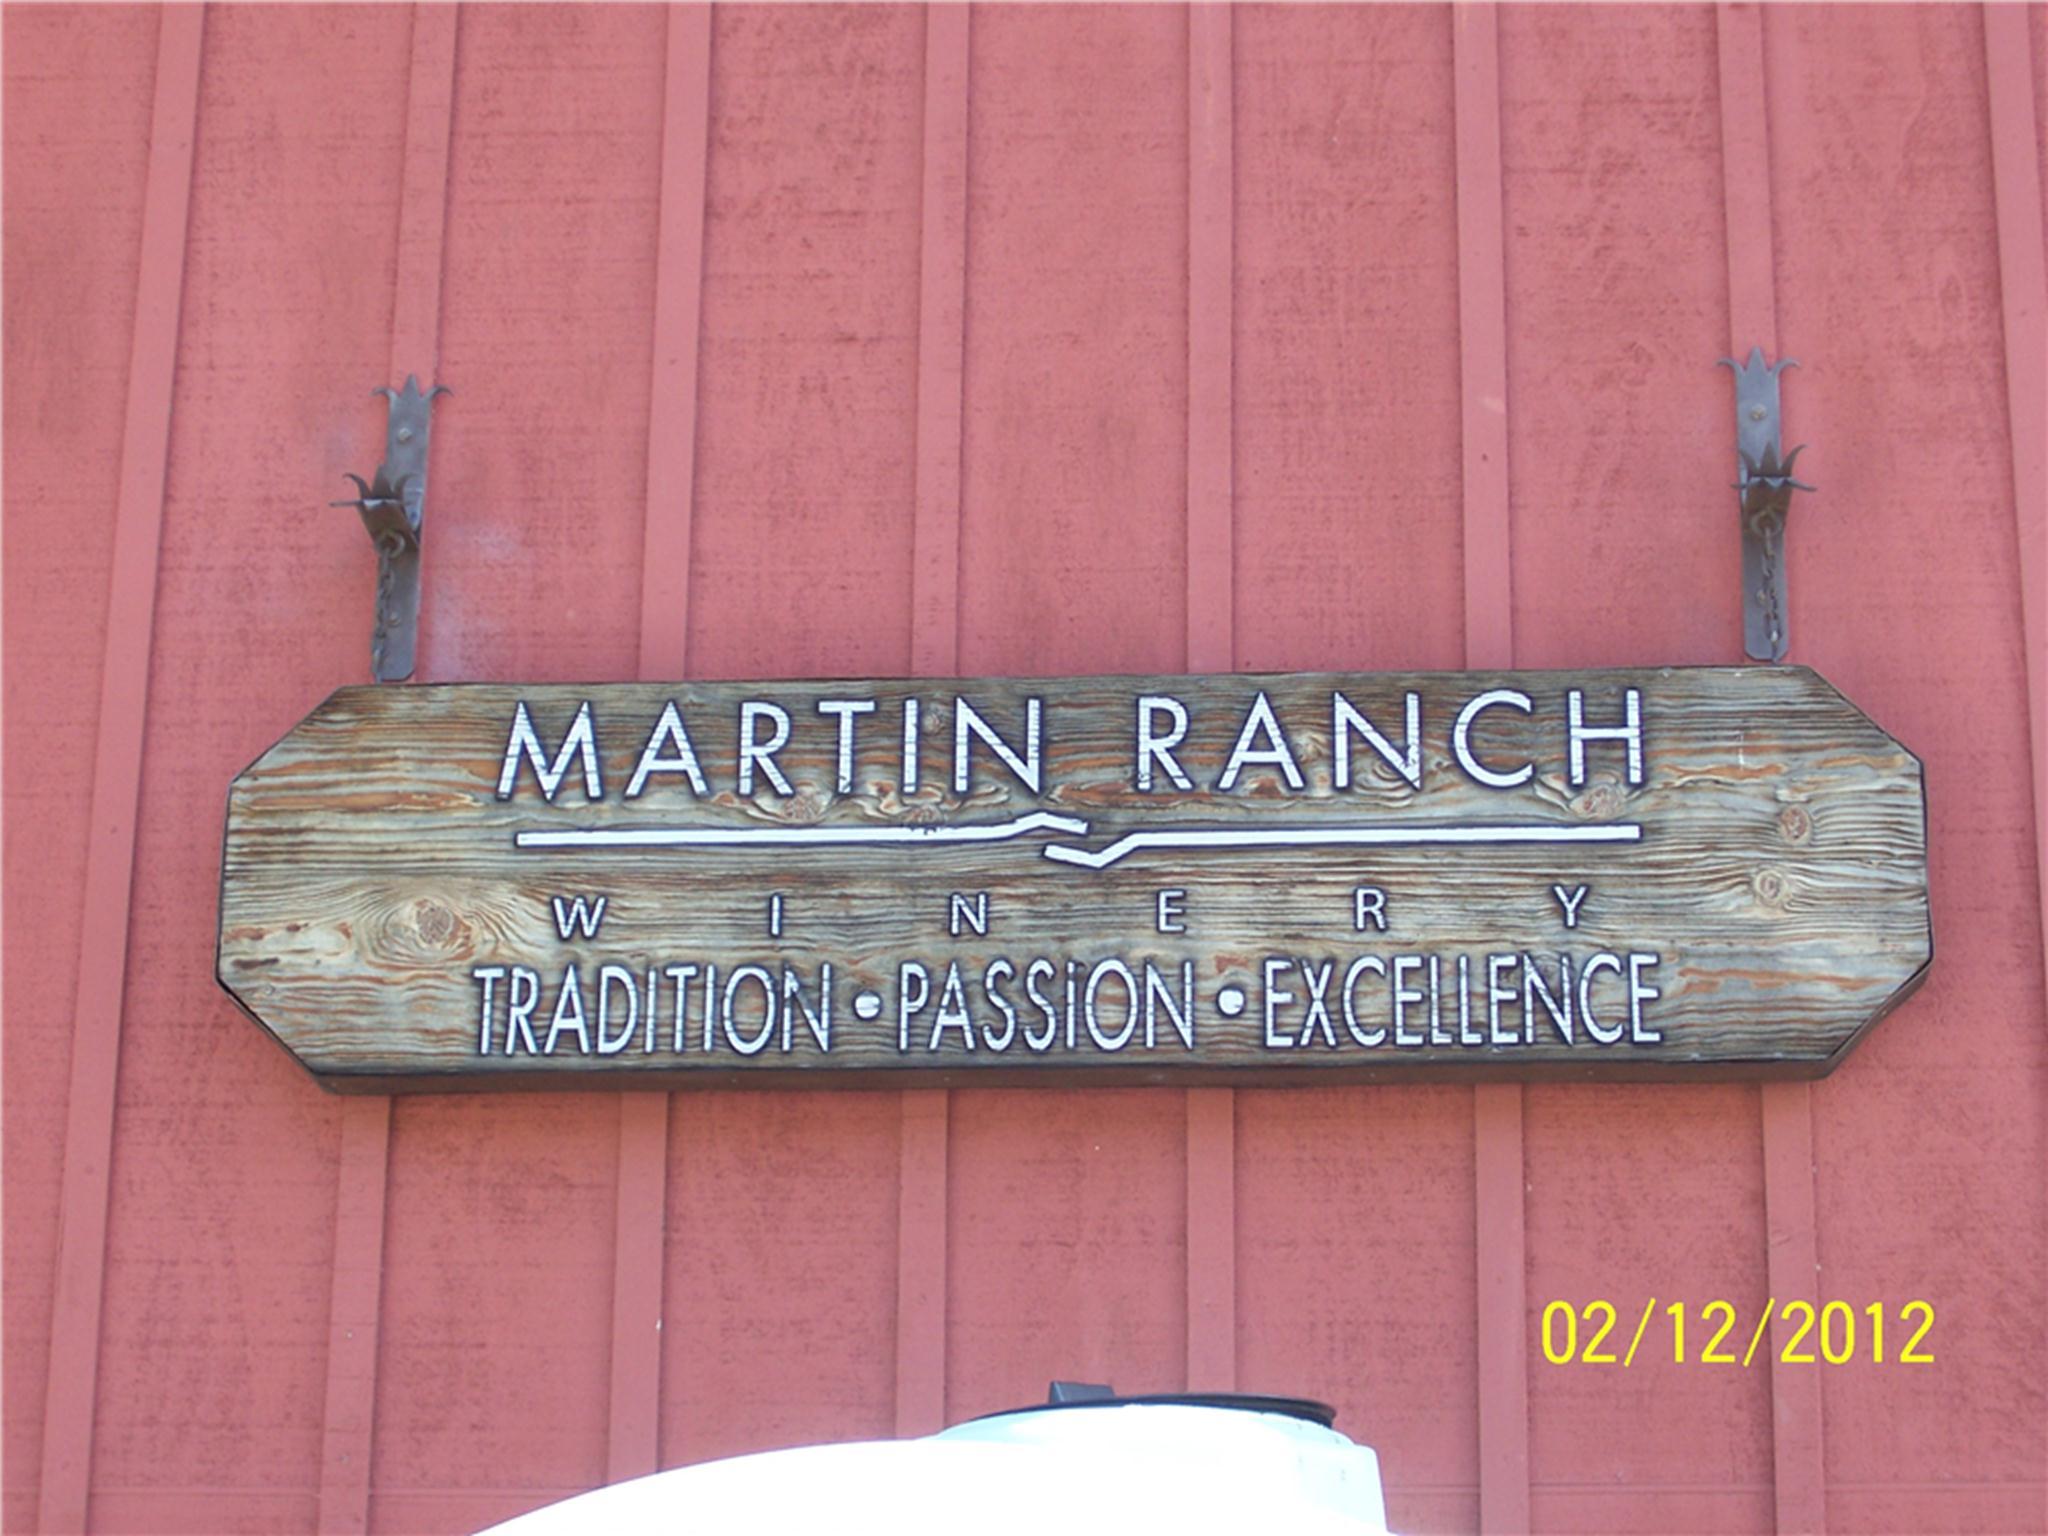 Martin Ranch sign post